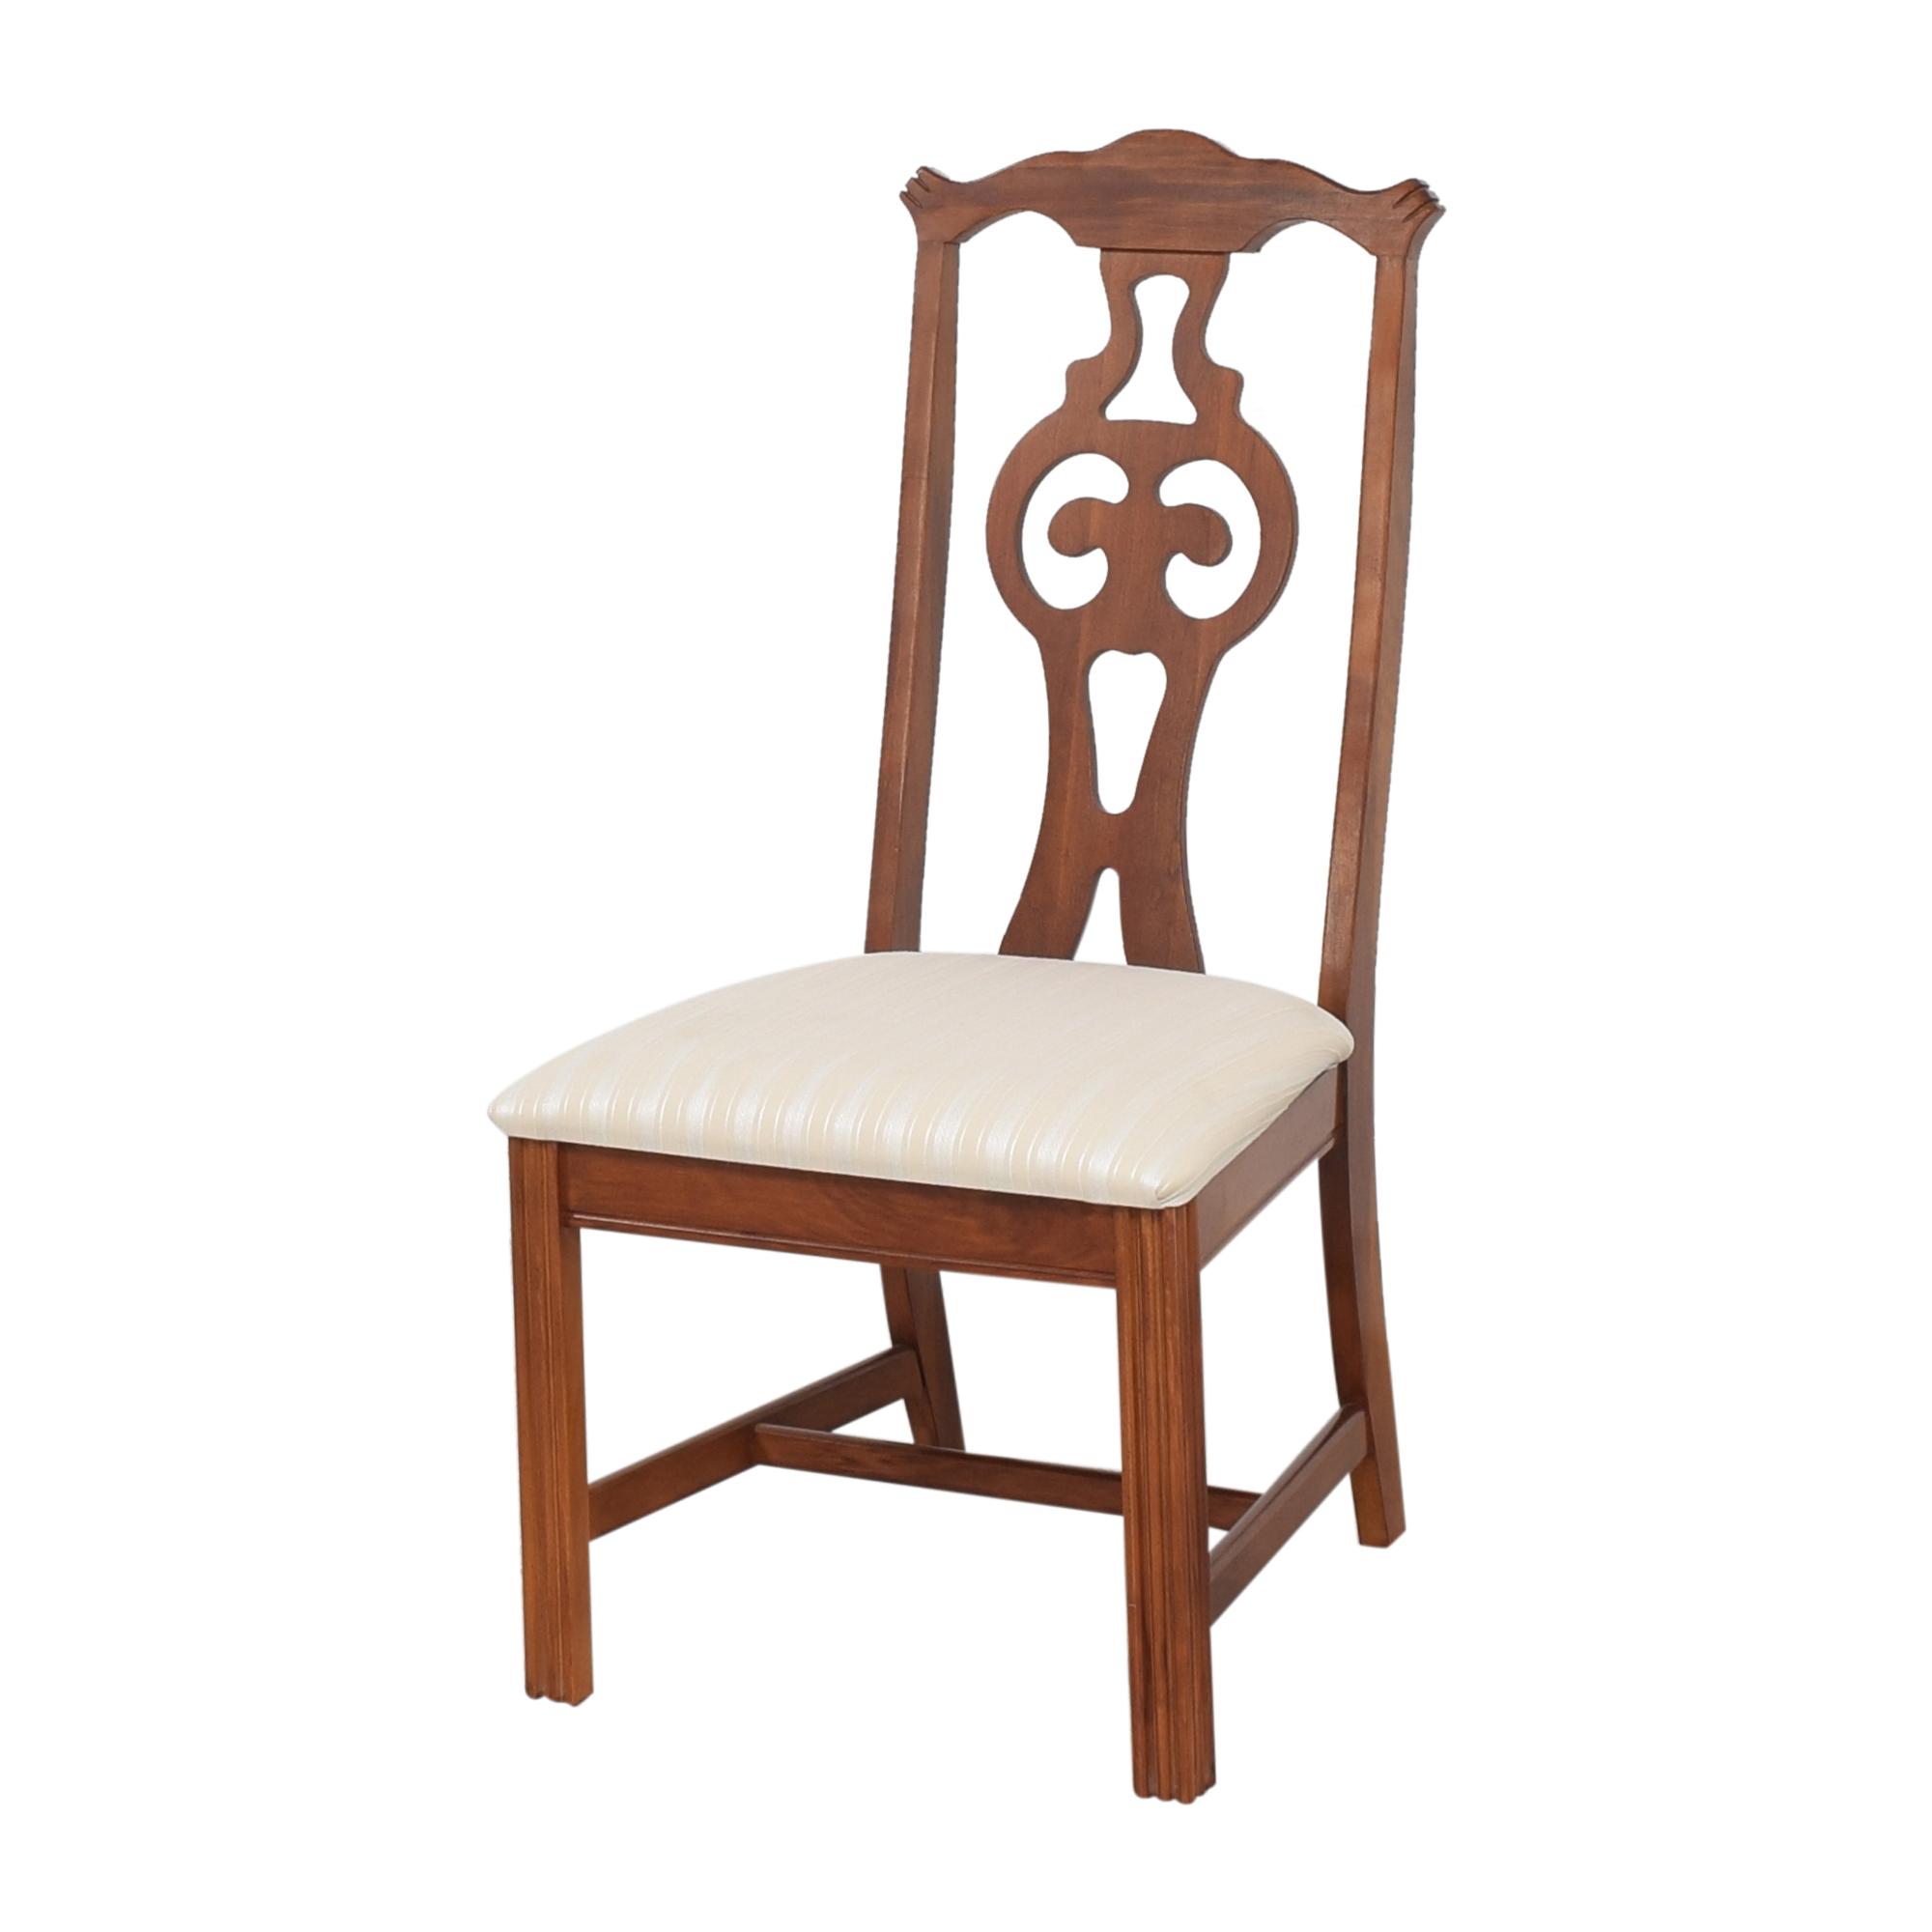 Bassett Furniture Bassett Furniture Upholstered Dining Chairs Chairs